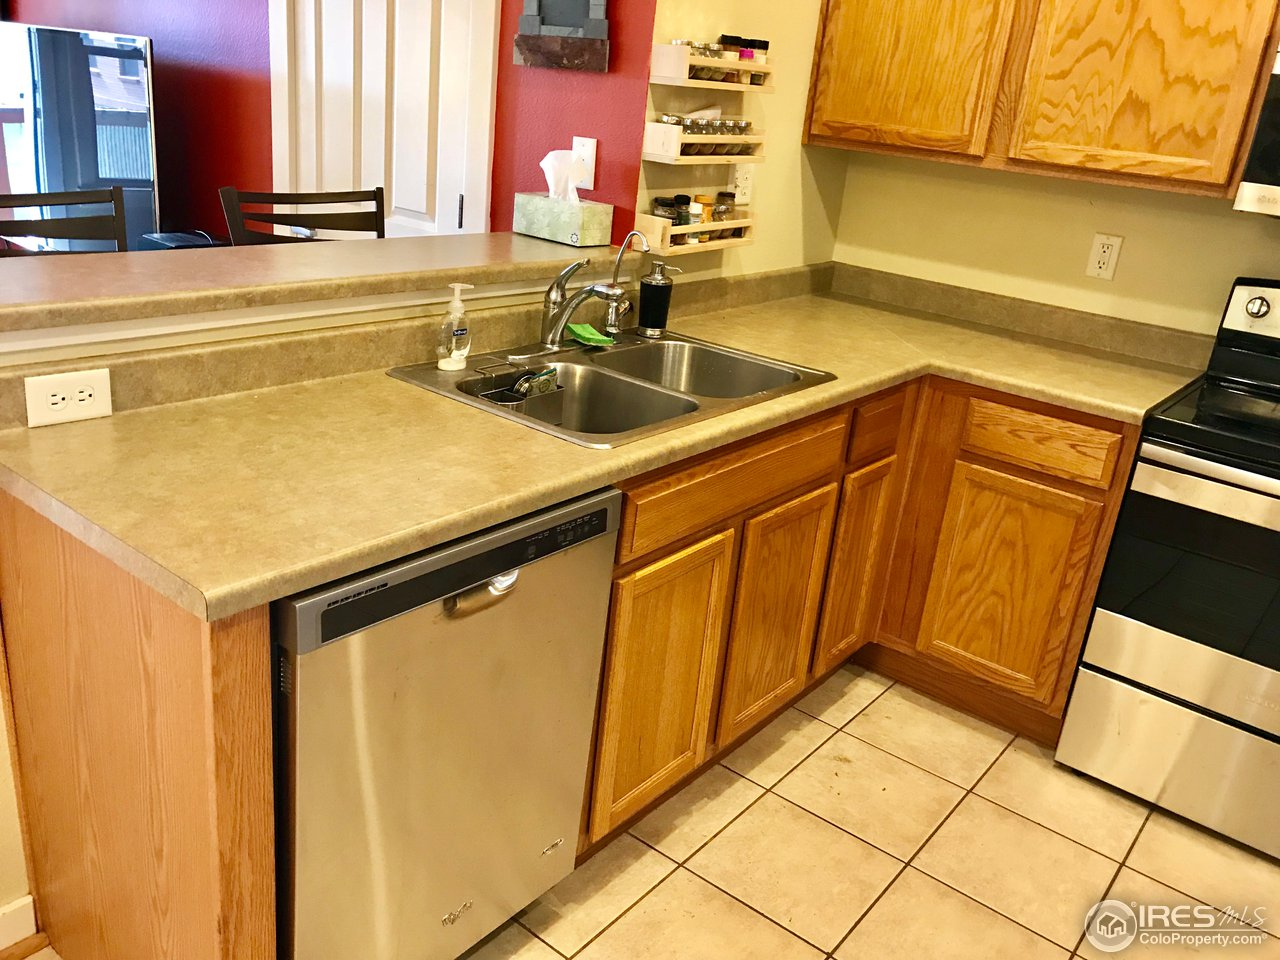 Tile floors in kitchen